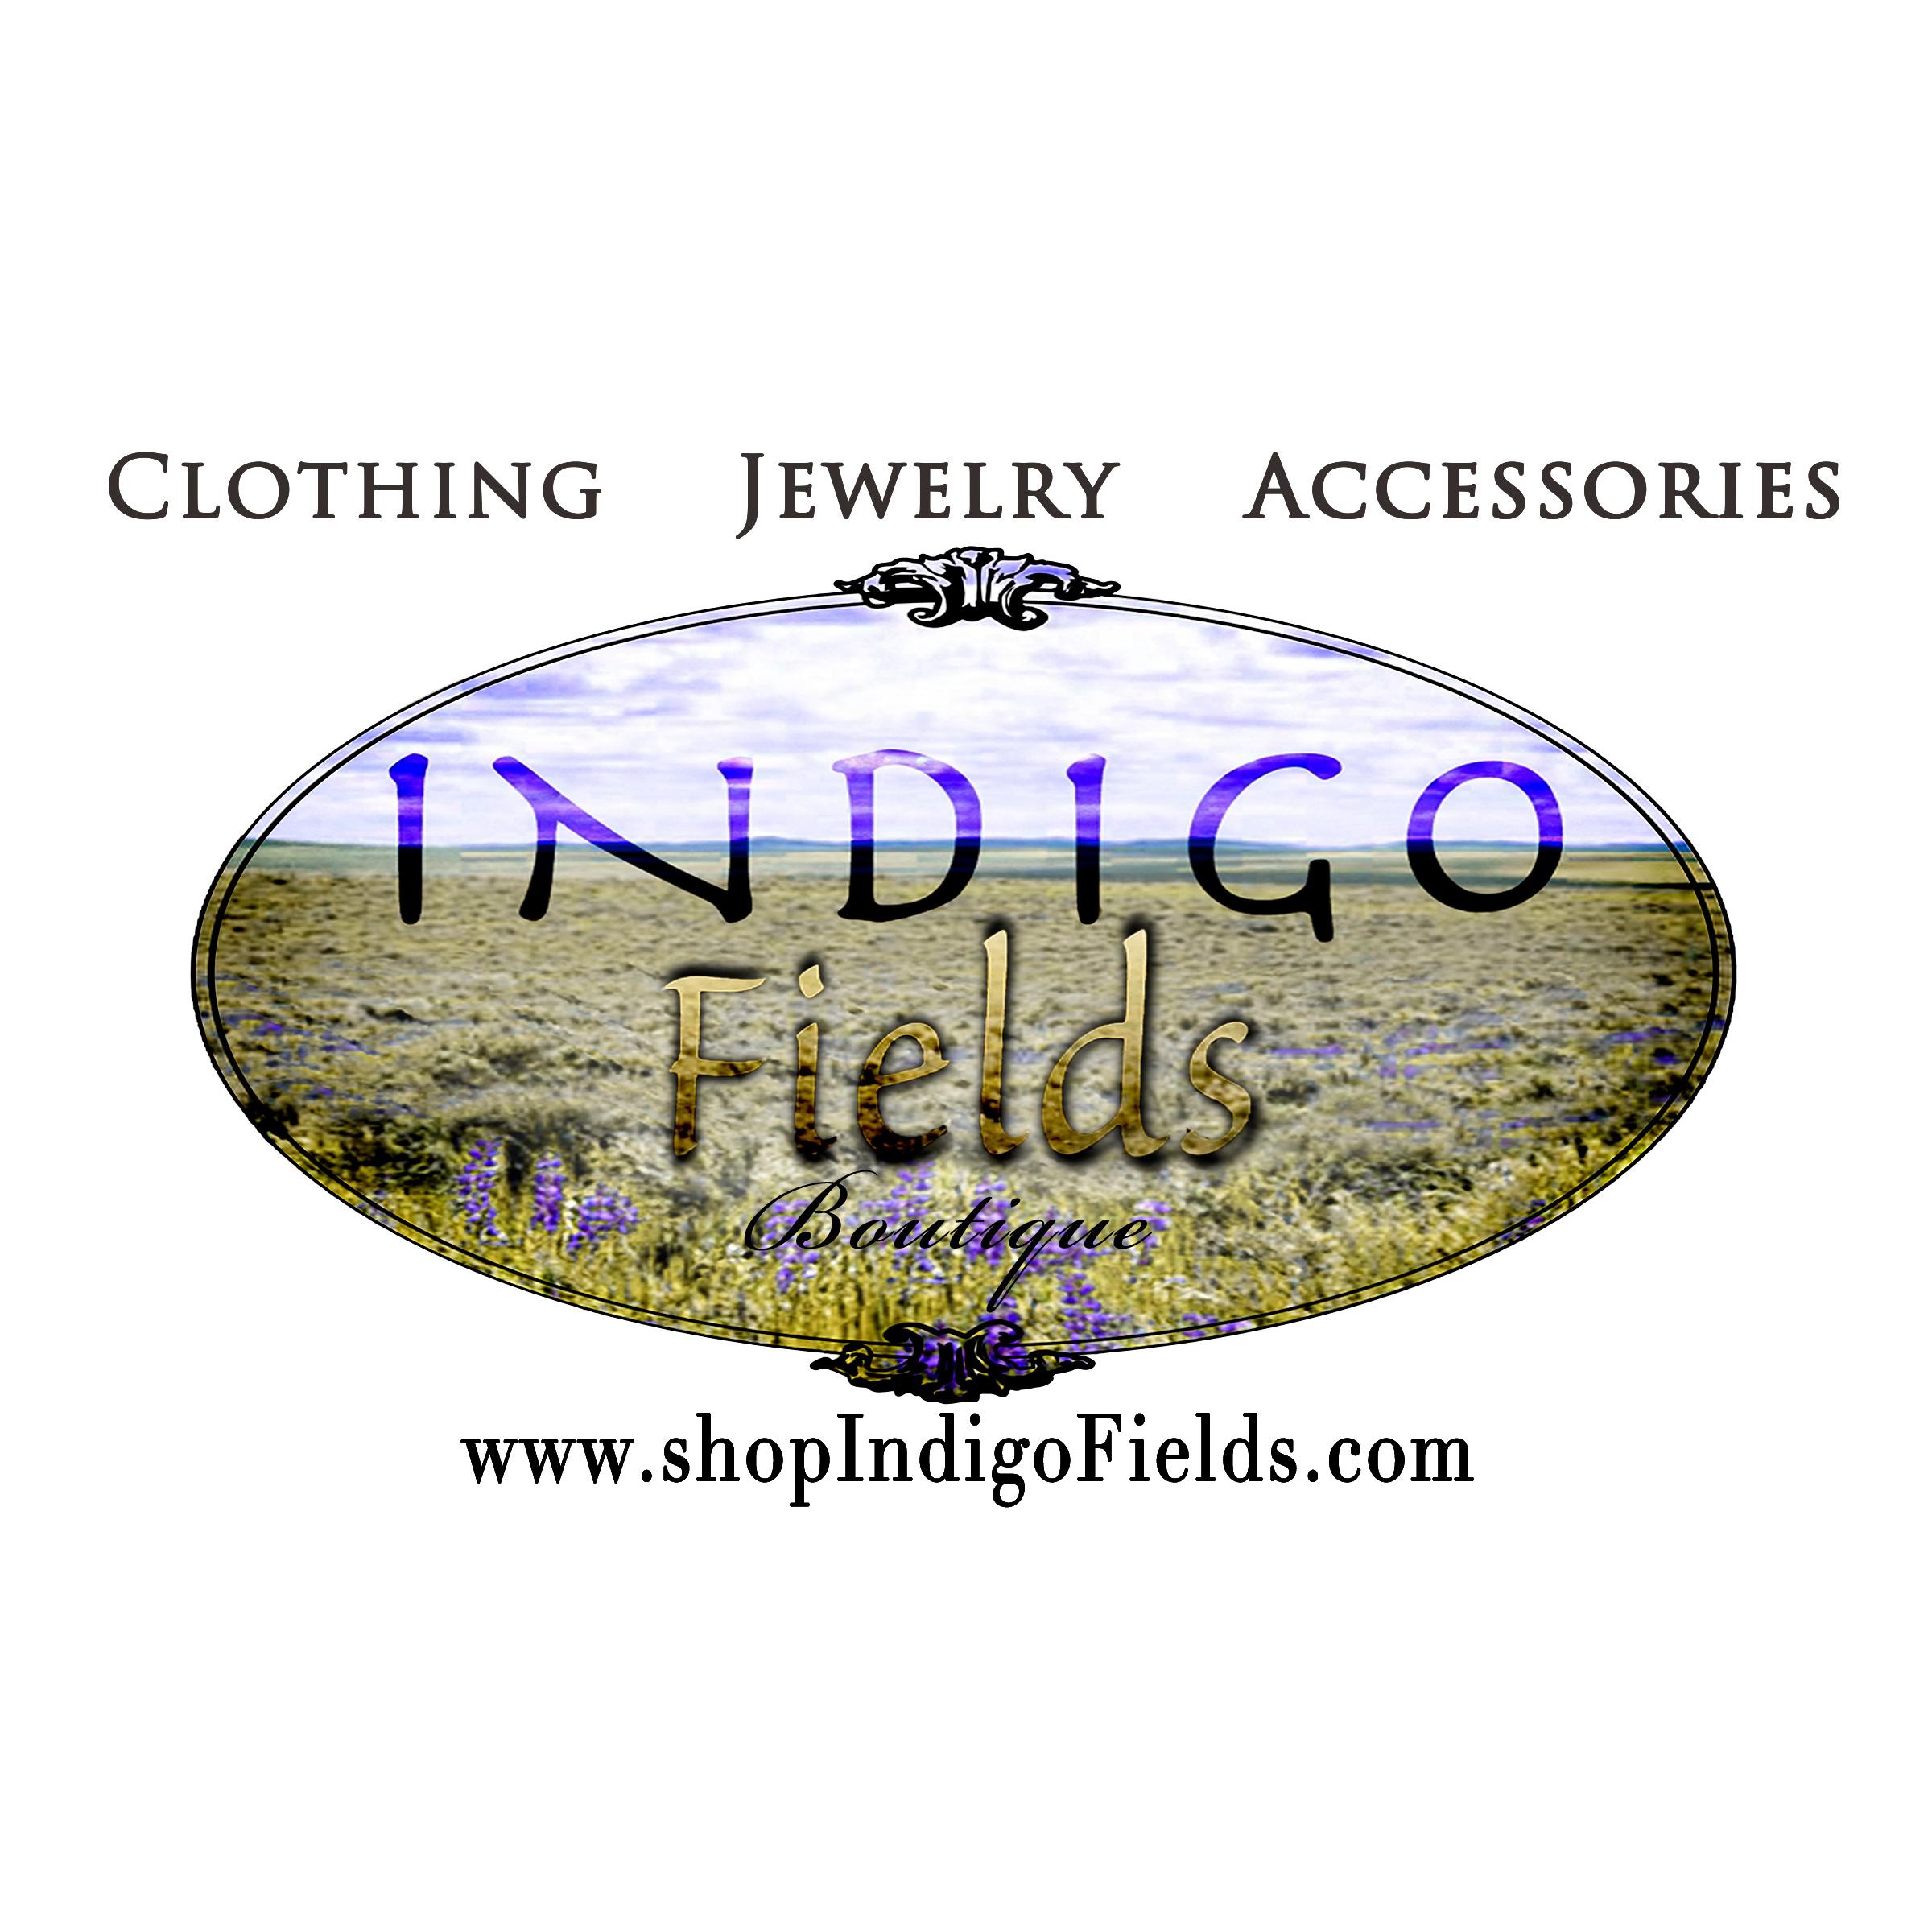 Indigo Fields Boutique & Field's Coffee Shop